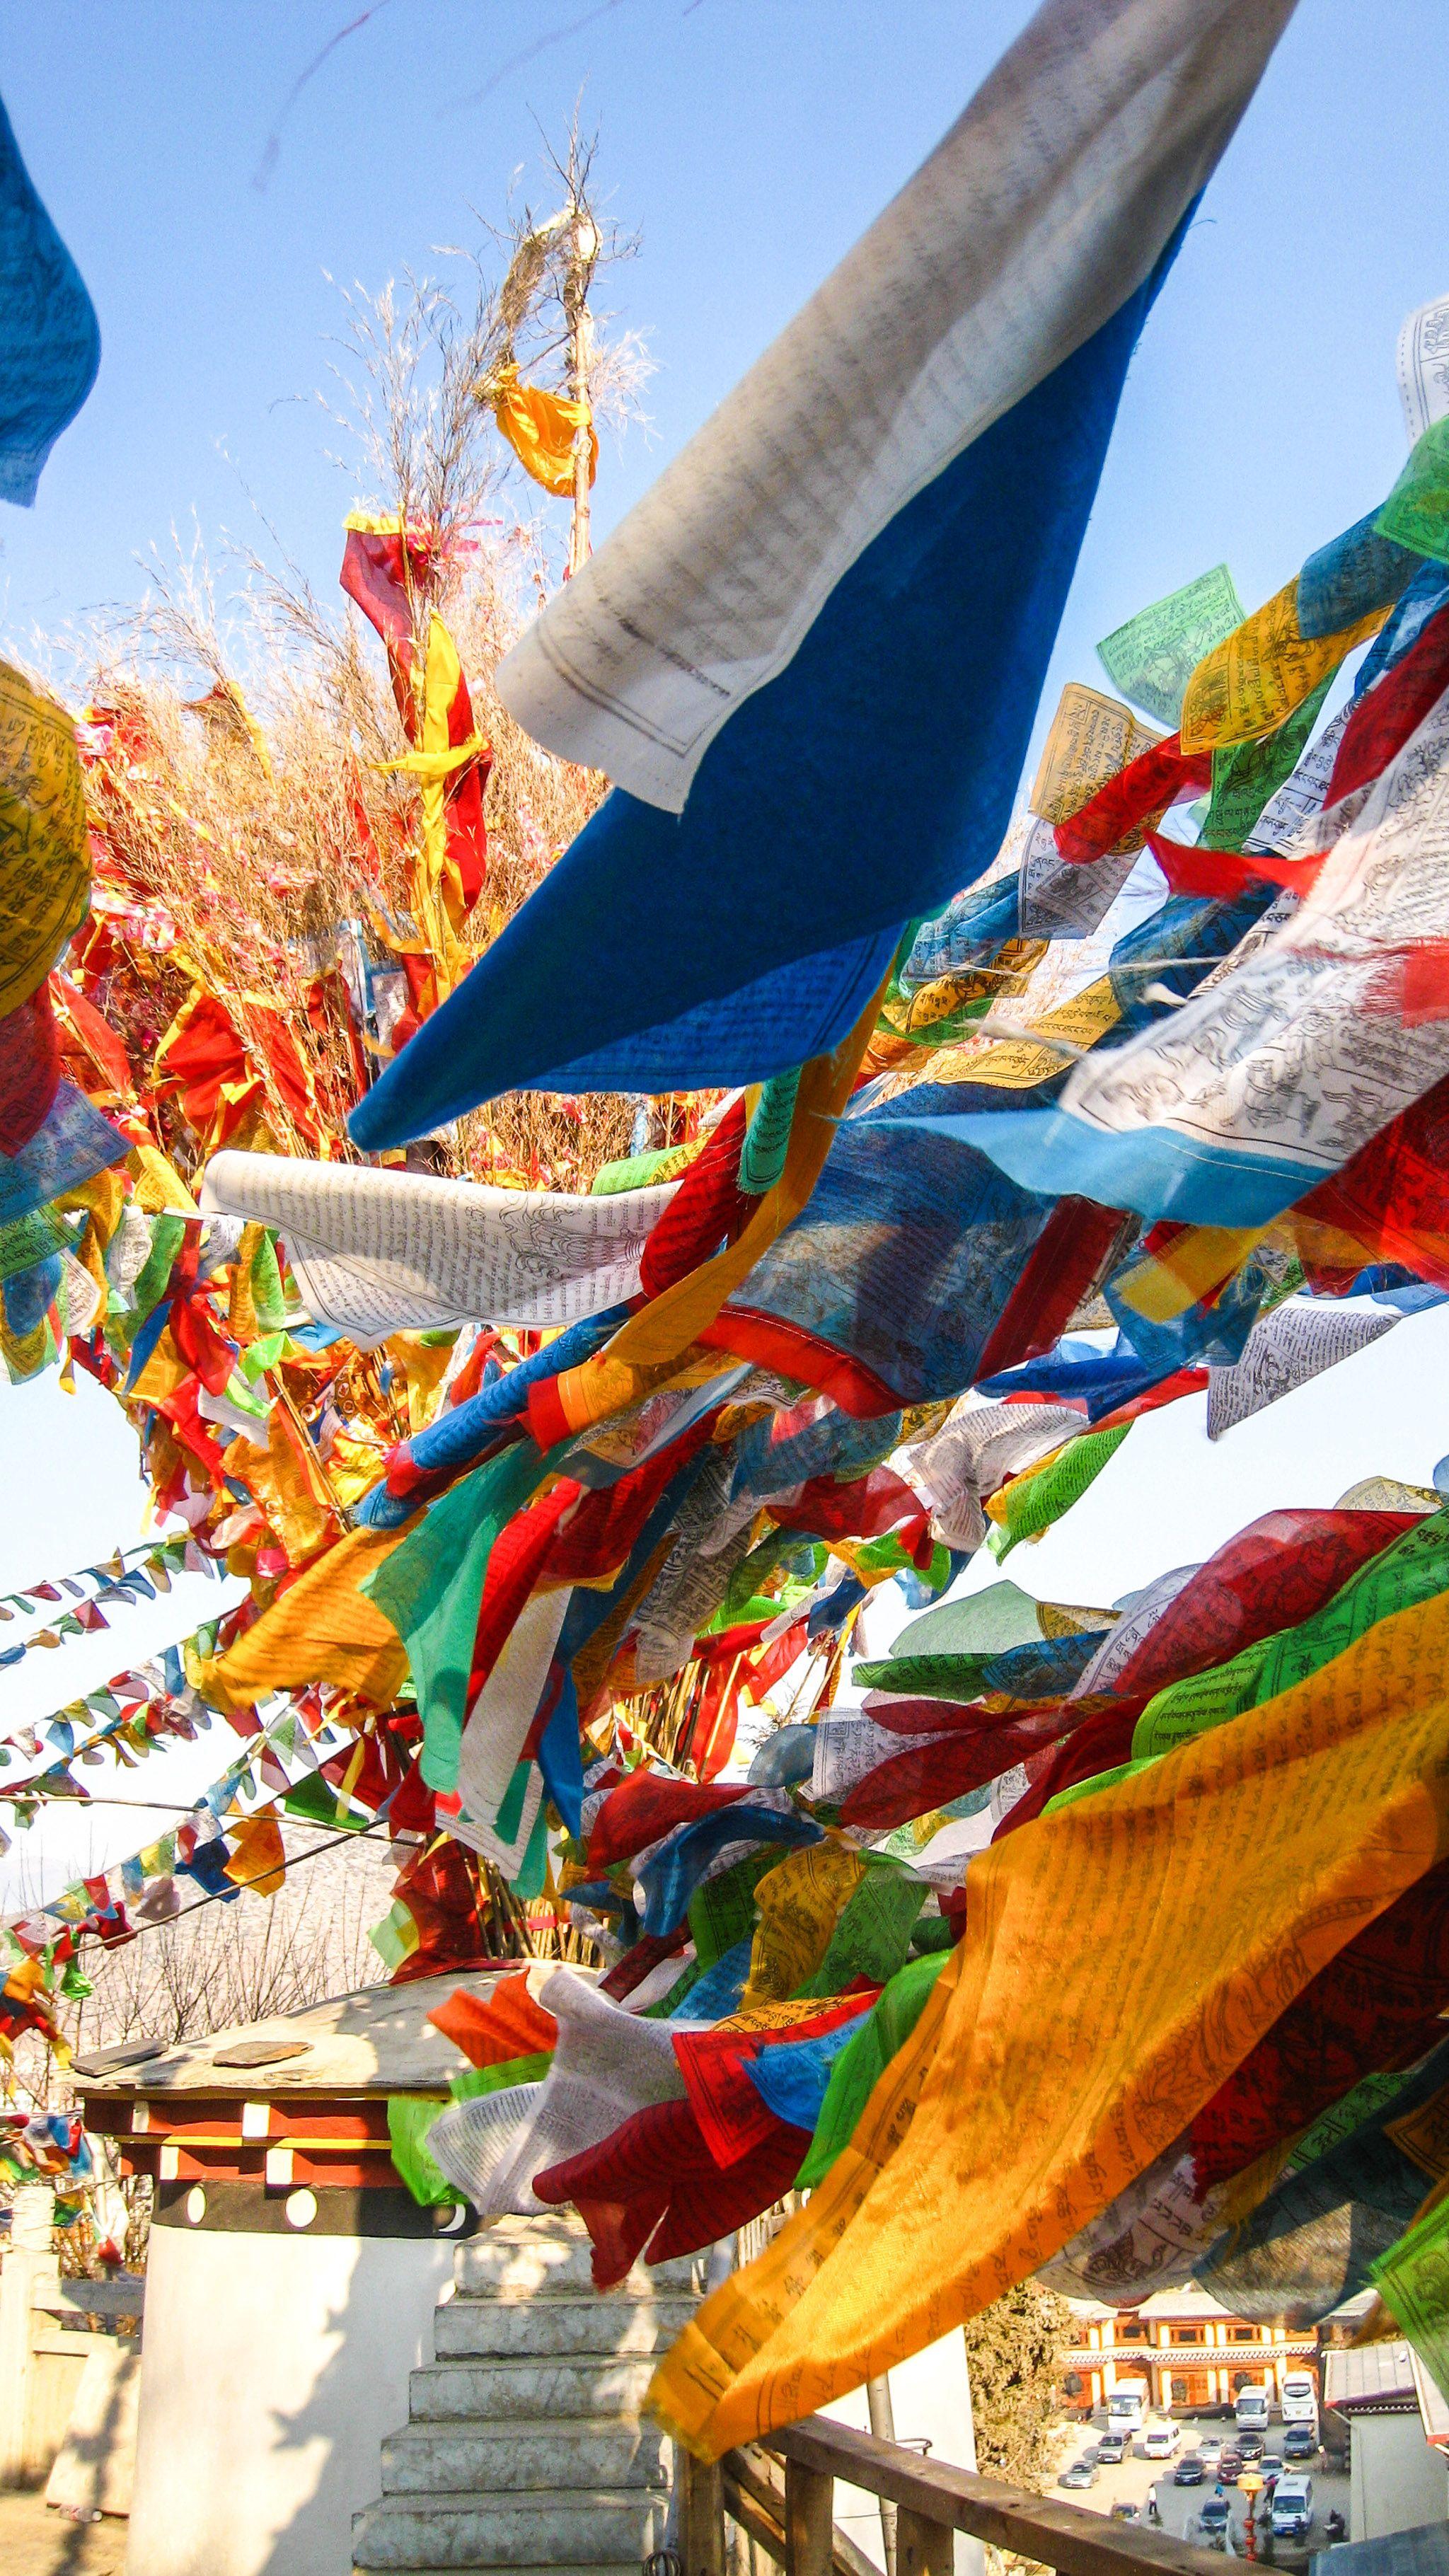 Traditional Tibetan Prayer Flags In Shangri La Yes Shangri La Is Real In Southwestern China On The Border Of Tibet Tibetan Prayer Flag Tibet Prayer Flags